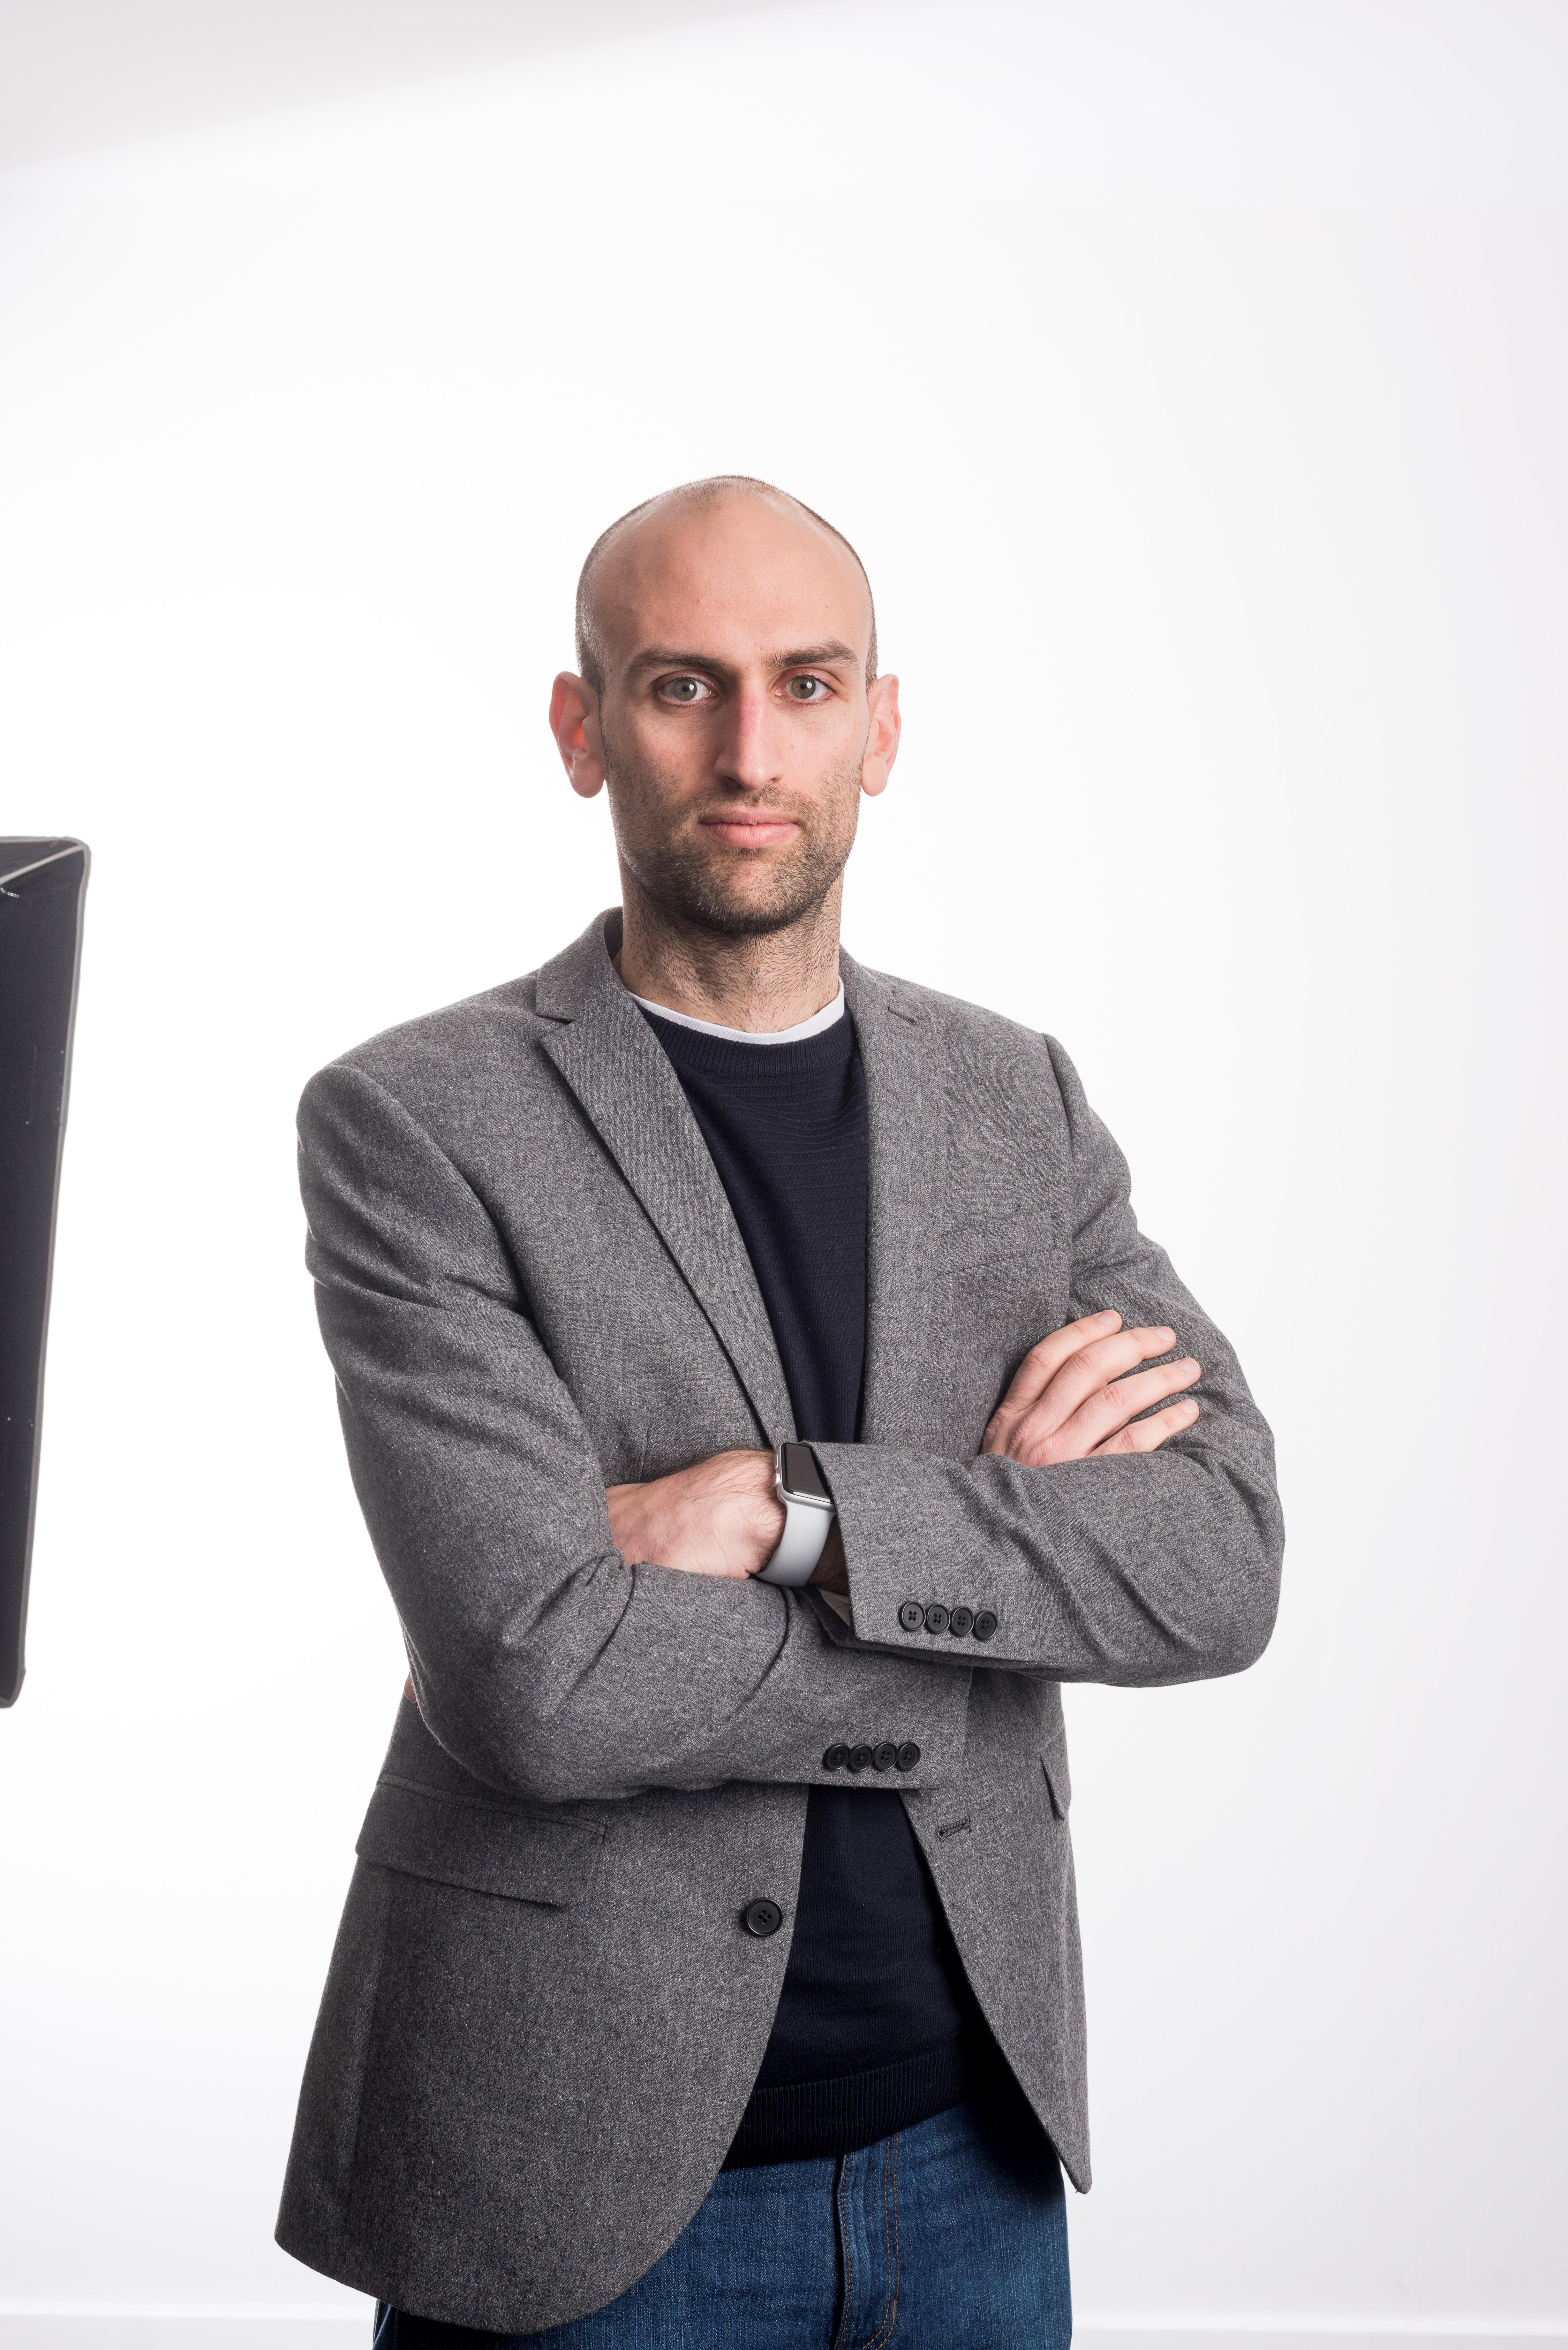 Aaron Asadi, Future (Future)